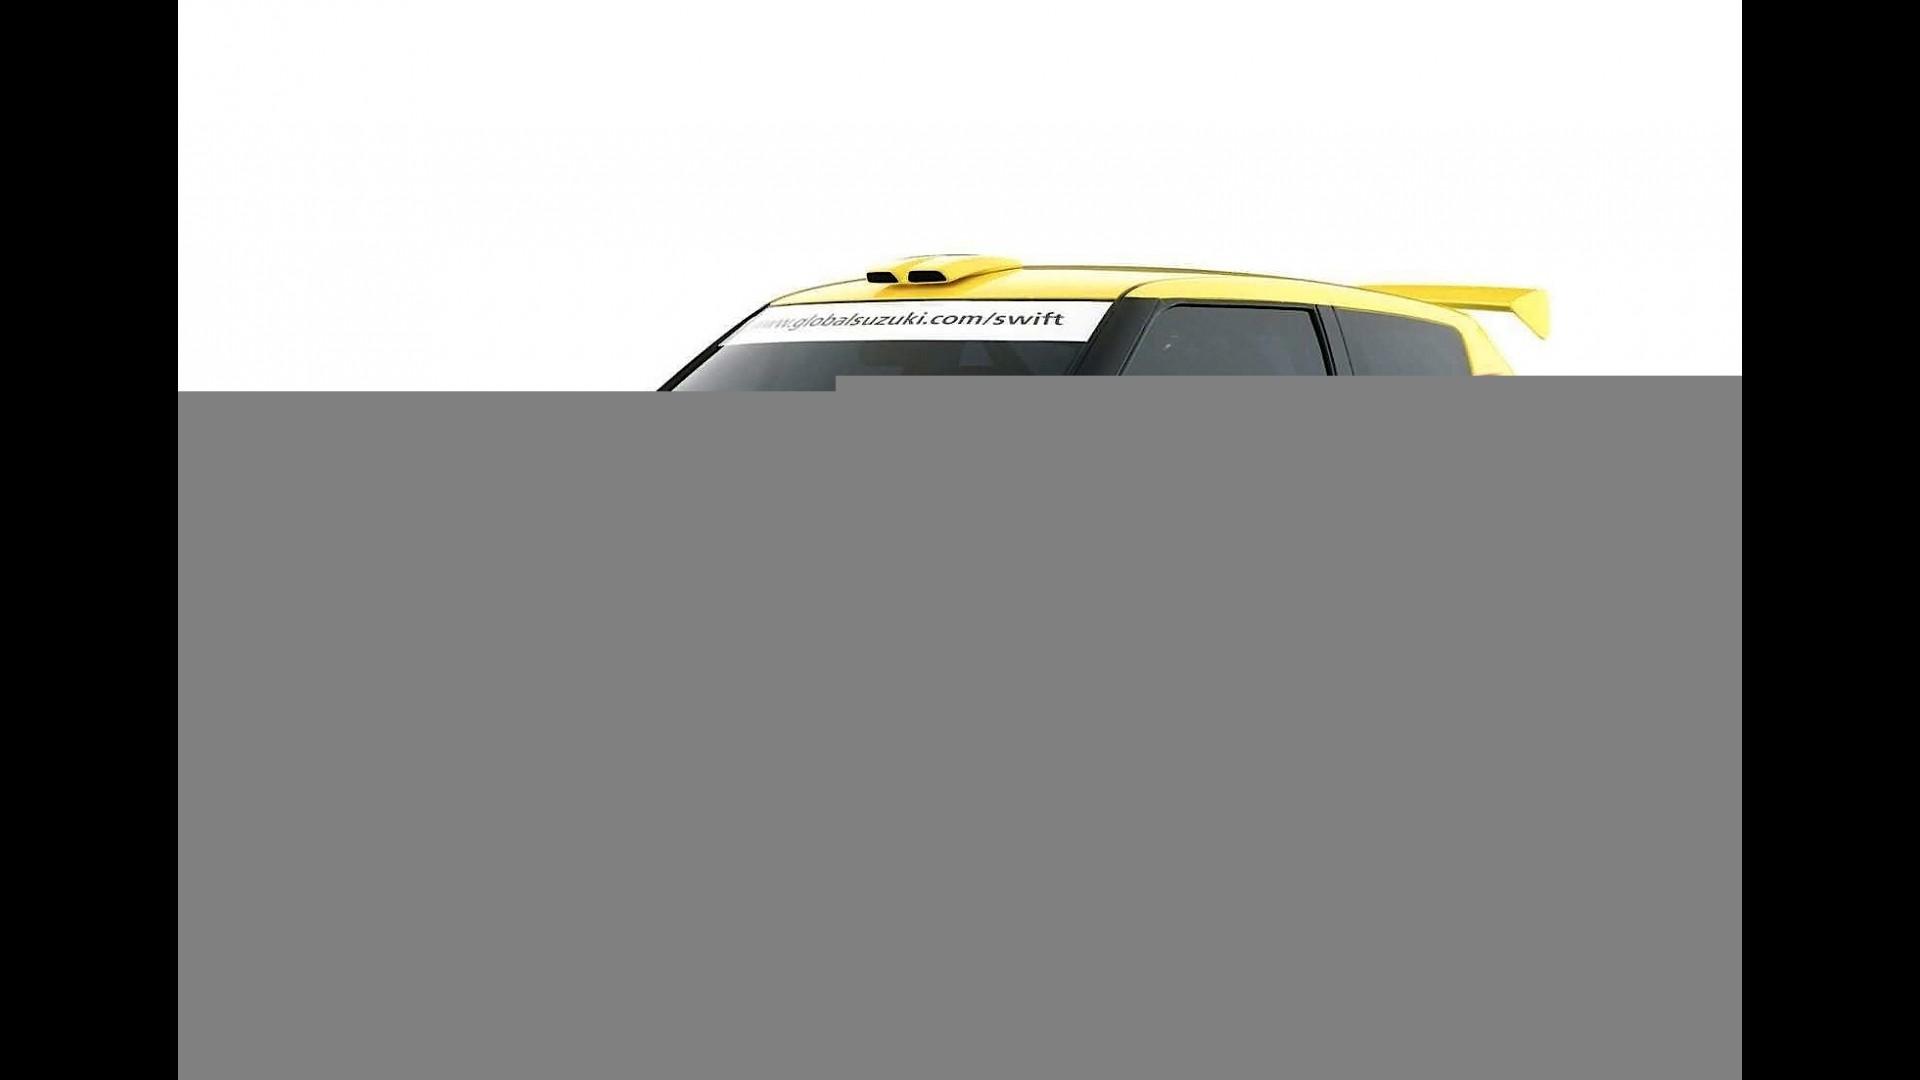 Suzuki Swift Rally Car